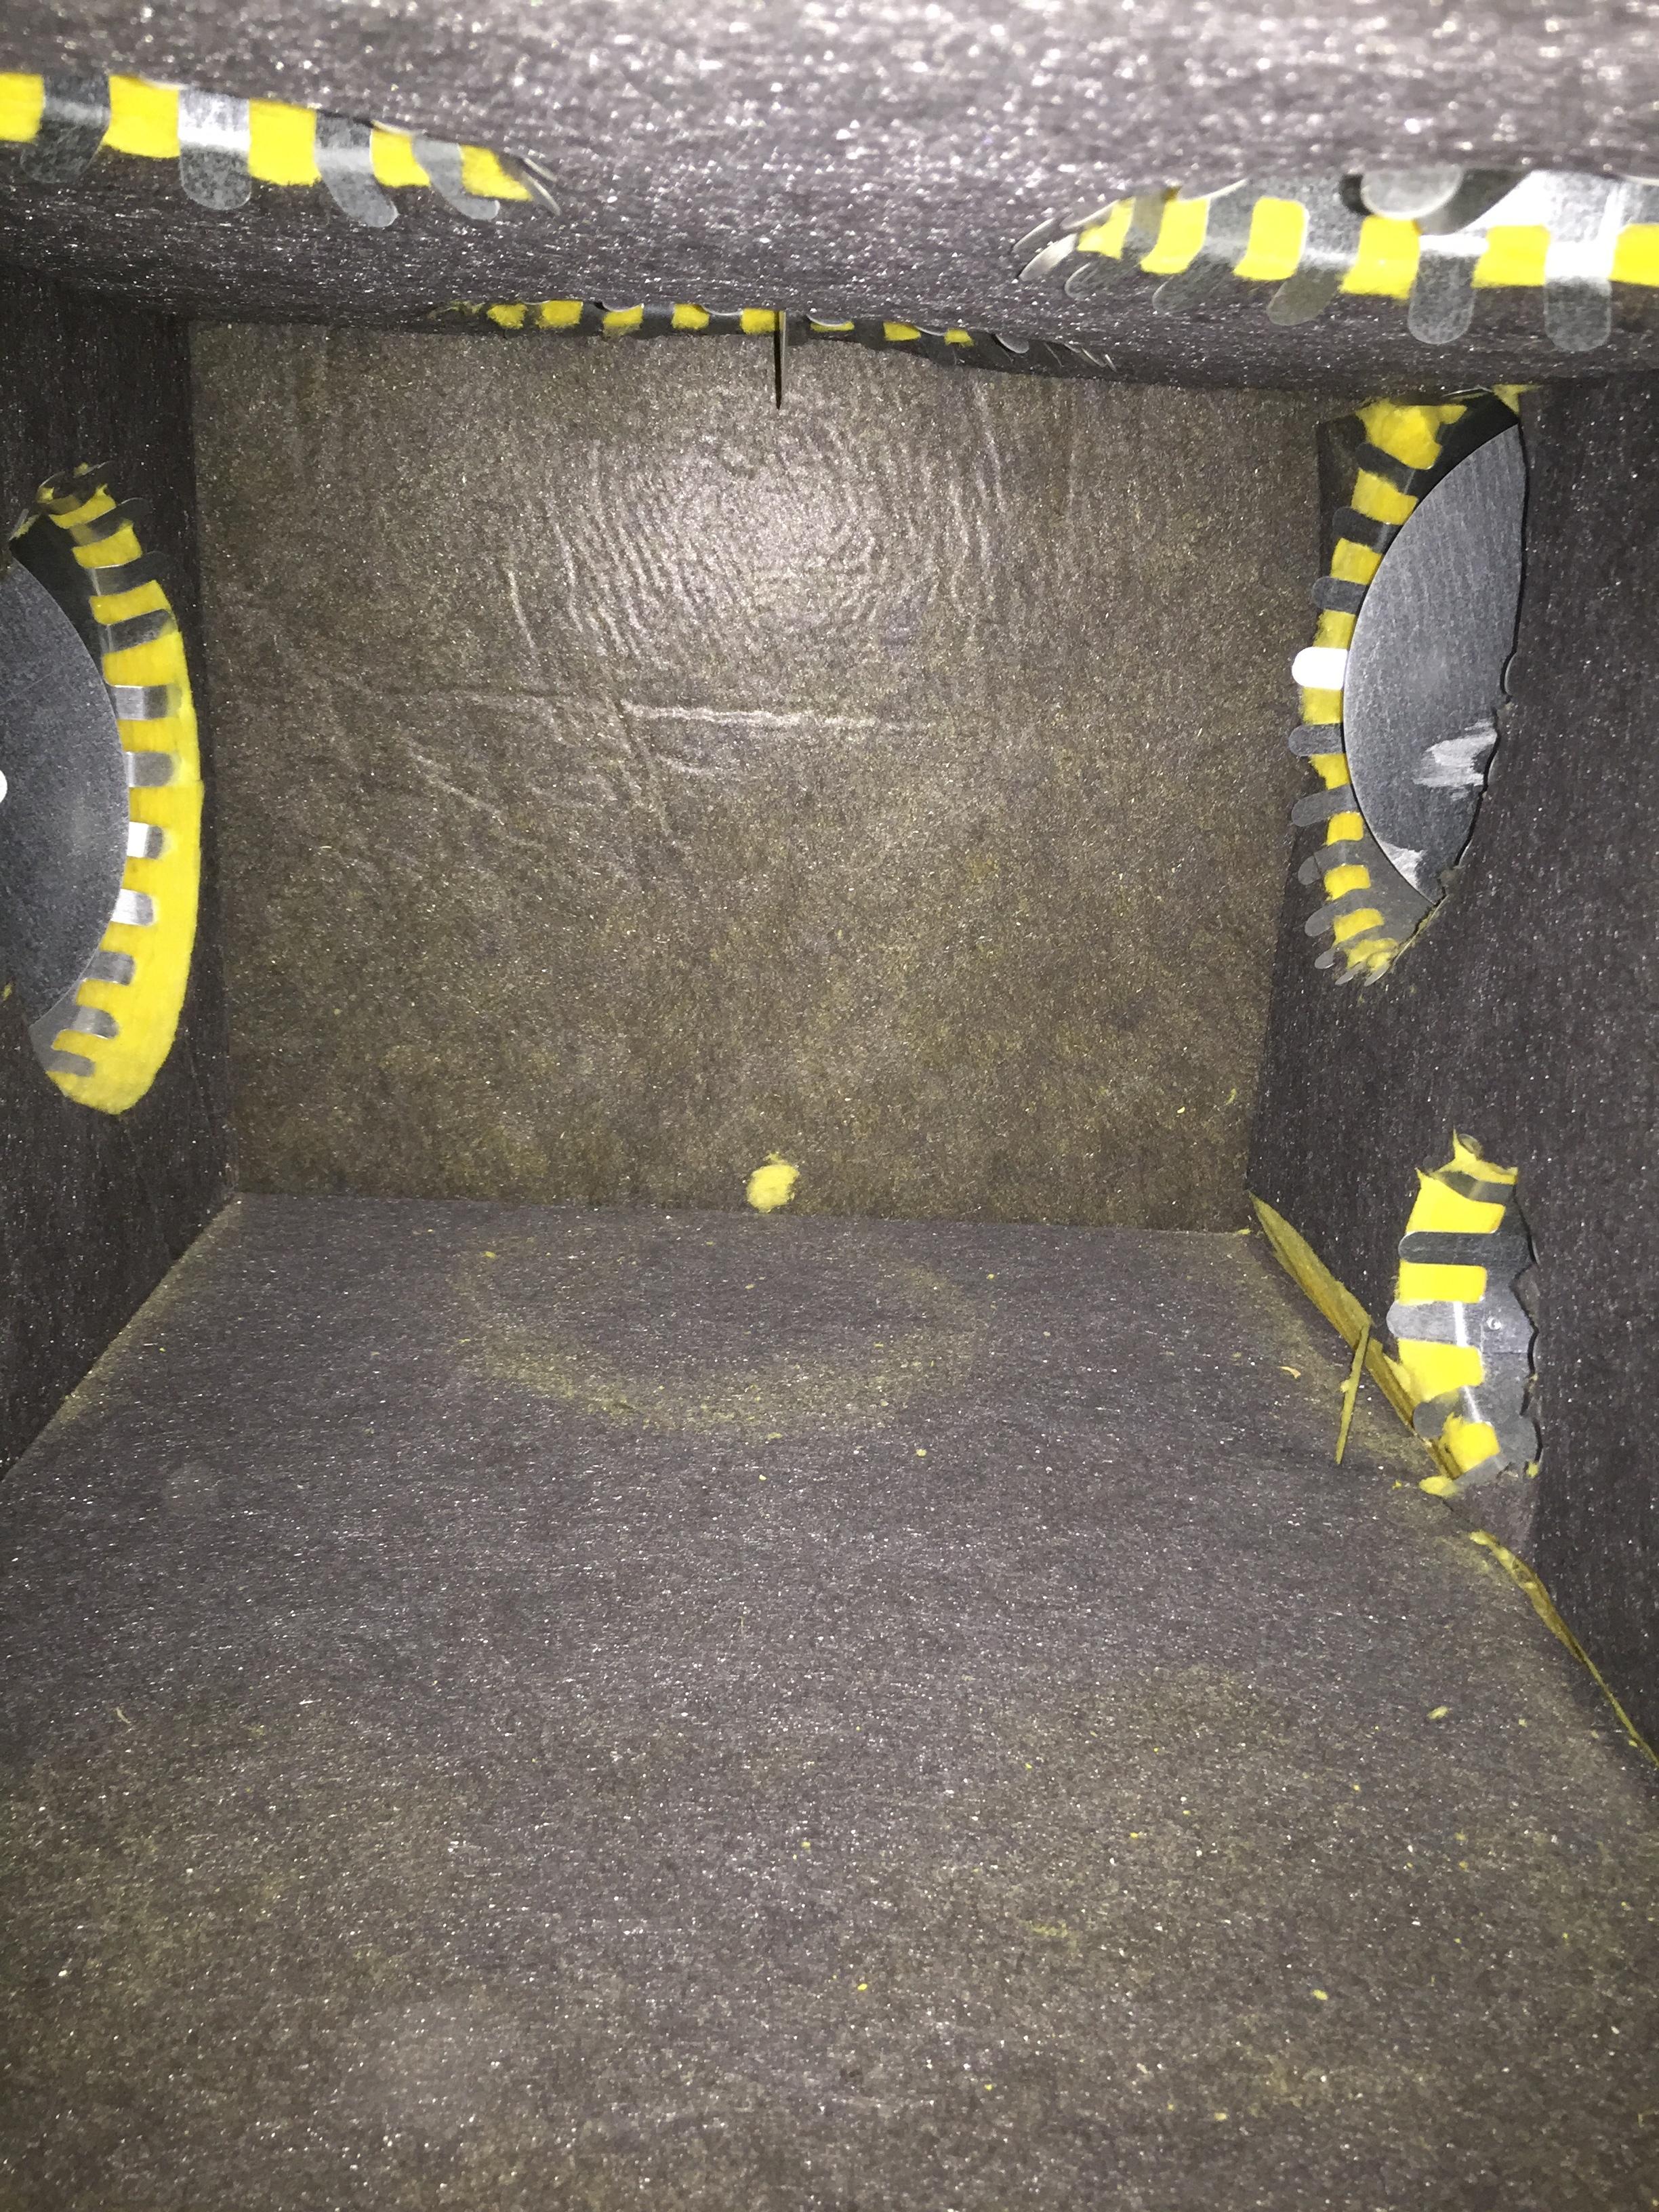 R-8 Plenum with R-6 Colars - yellow is exposed fiberglass